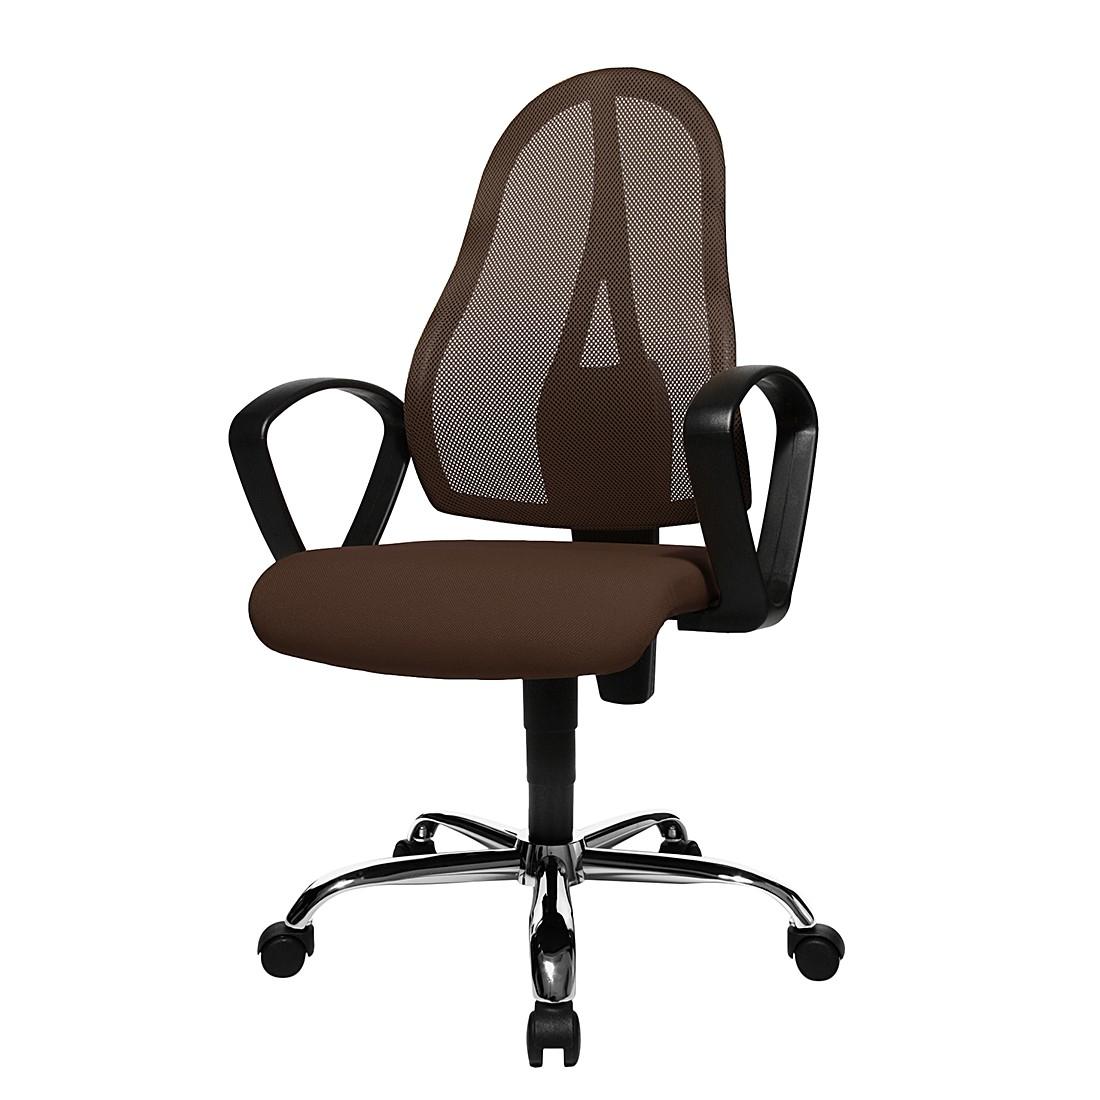 home24 Buerodrehstuhl Open Point P Somo | Büro > Bürostühle und Sessel  > Bürostühle | Braun | Kunststoff - Textil | Topstar